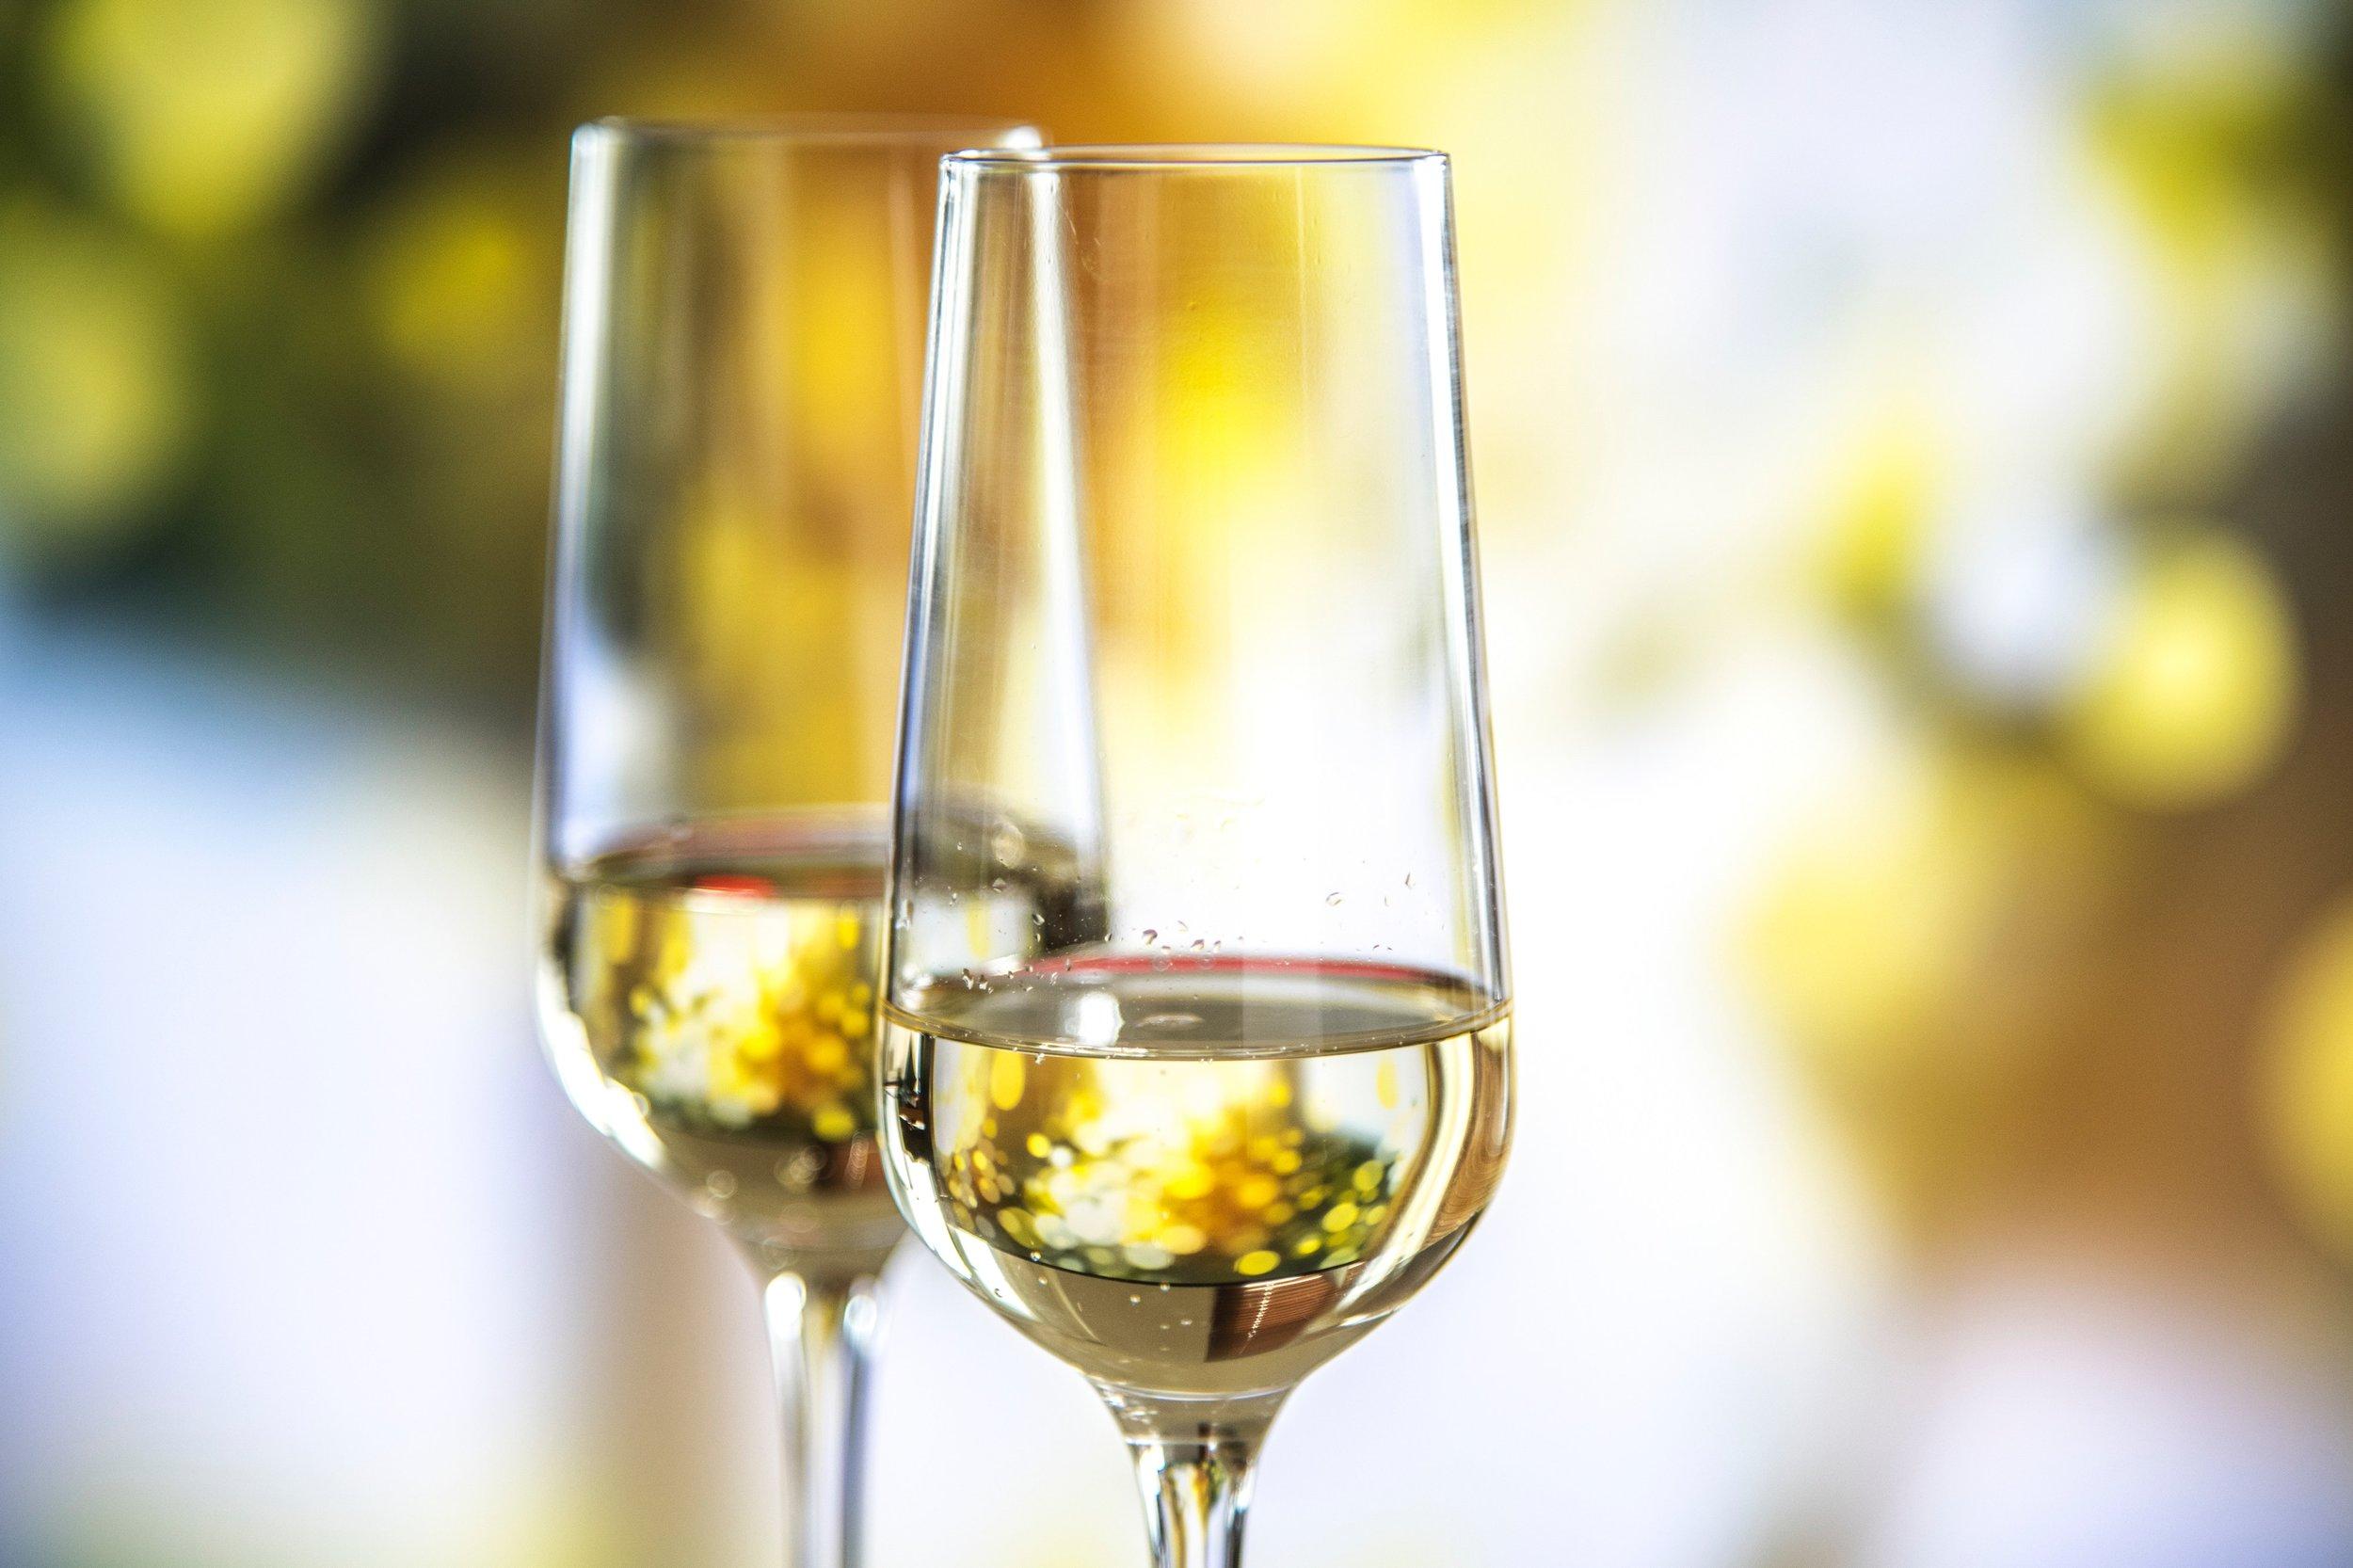 alcoholic-alcoholic-beverages-anniversary-1323596.jpg